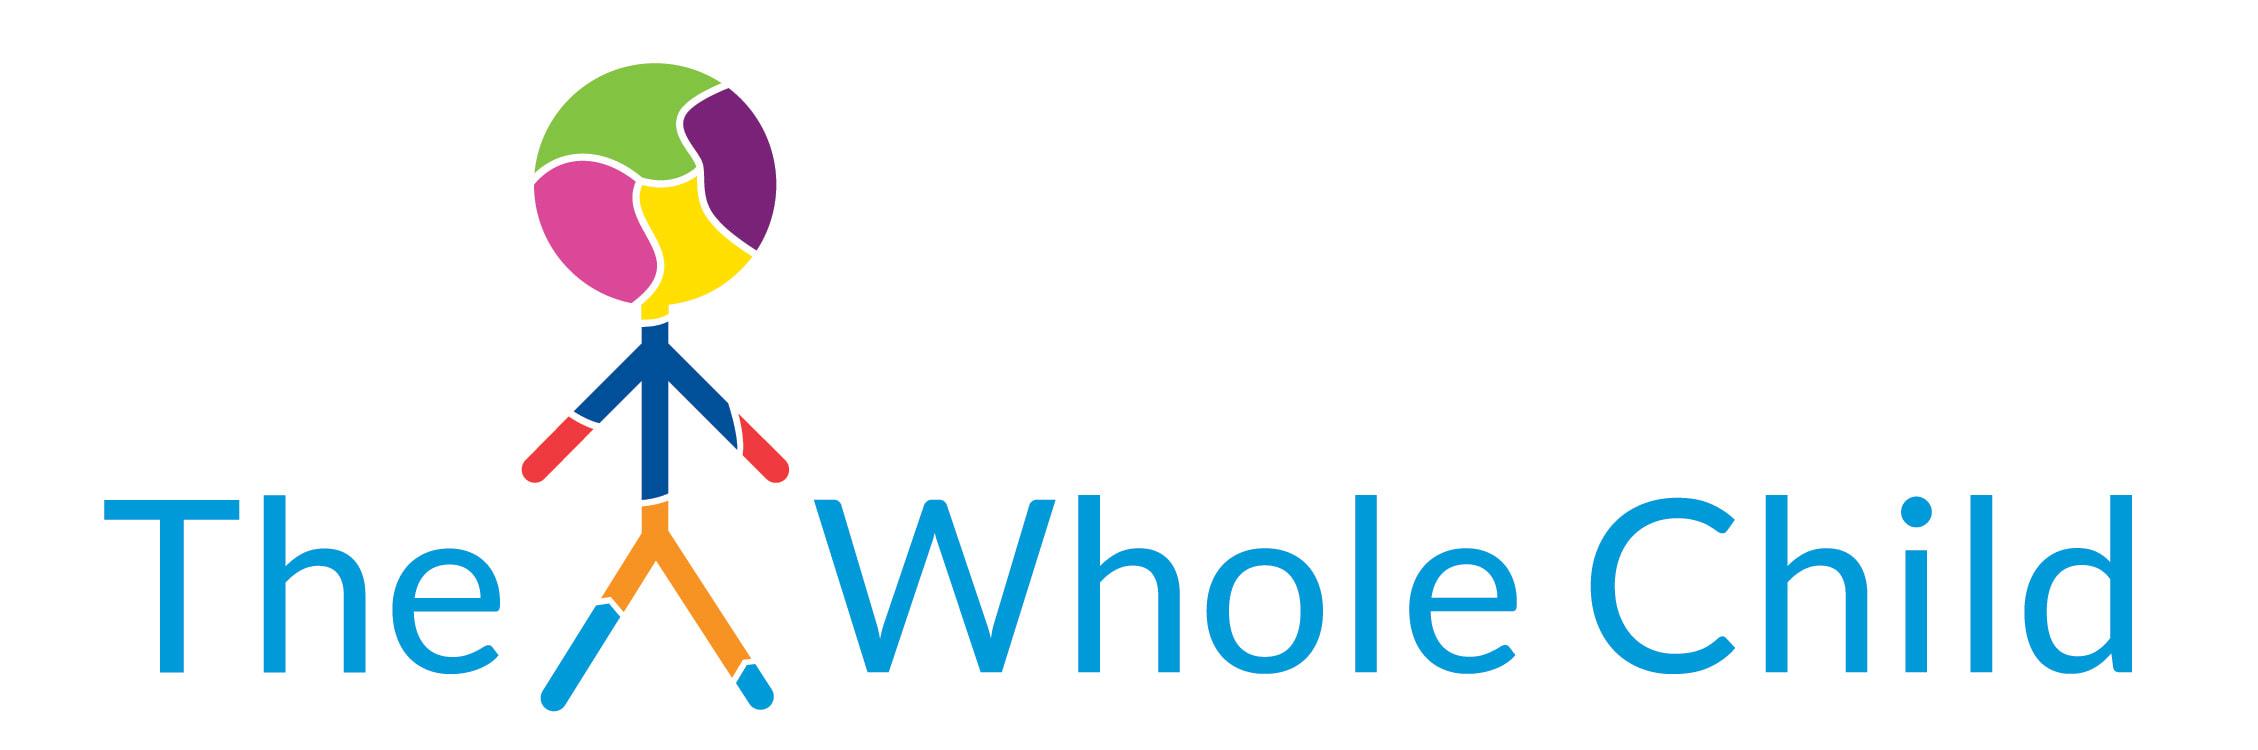 The Whole Child Matters Logo.jpg